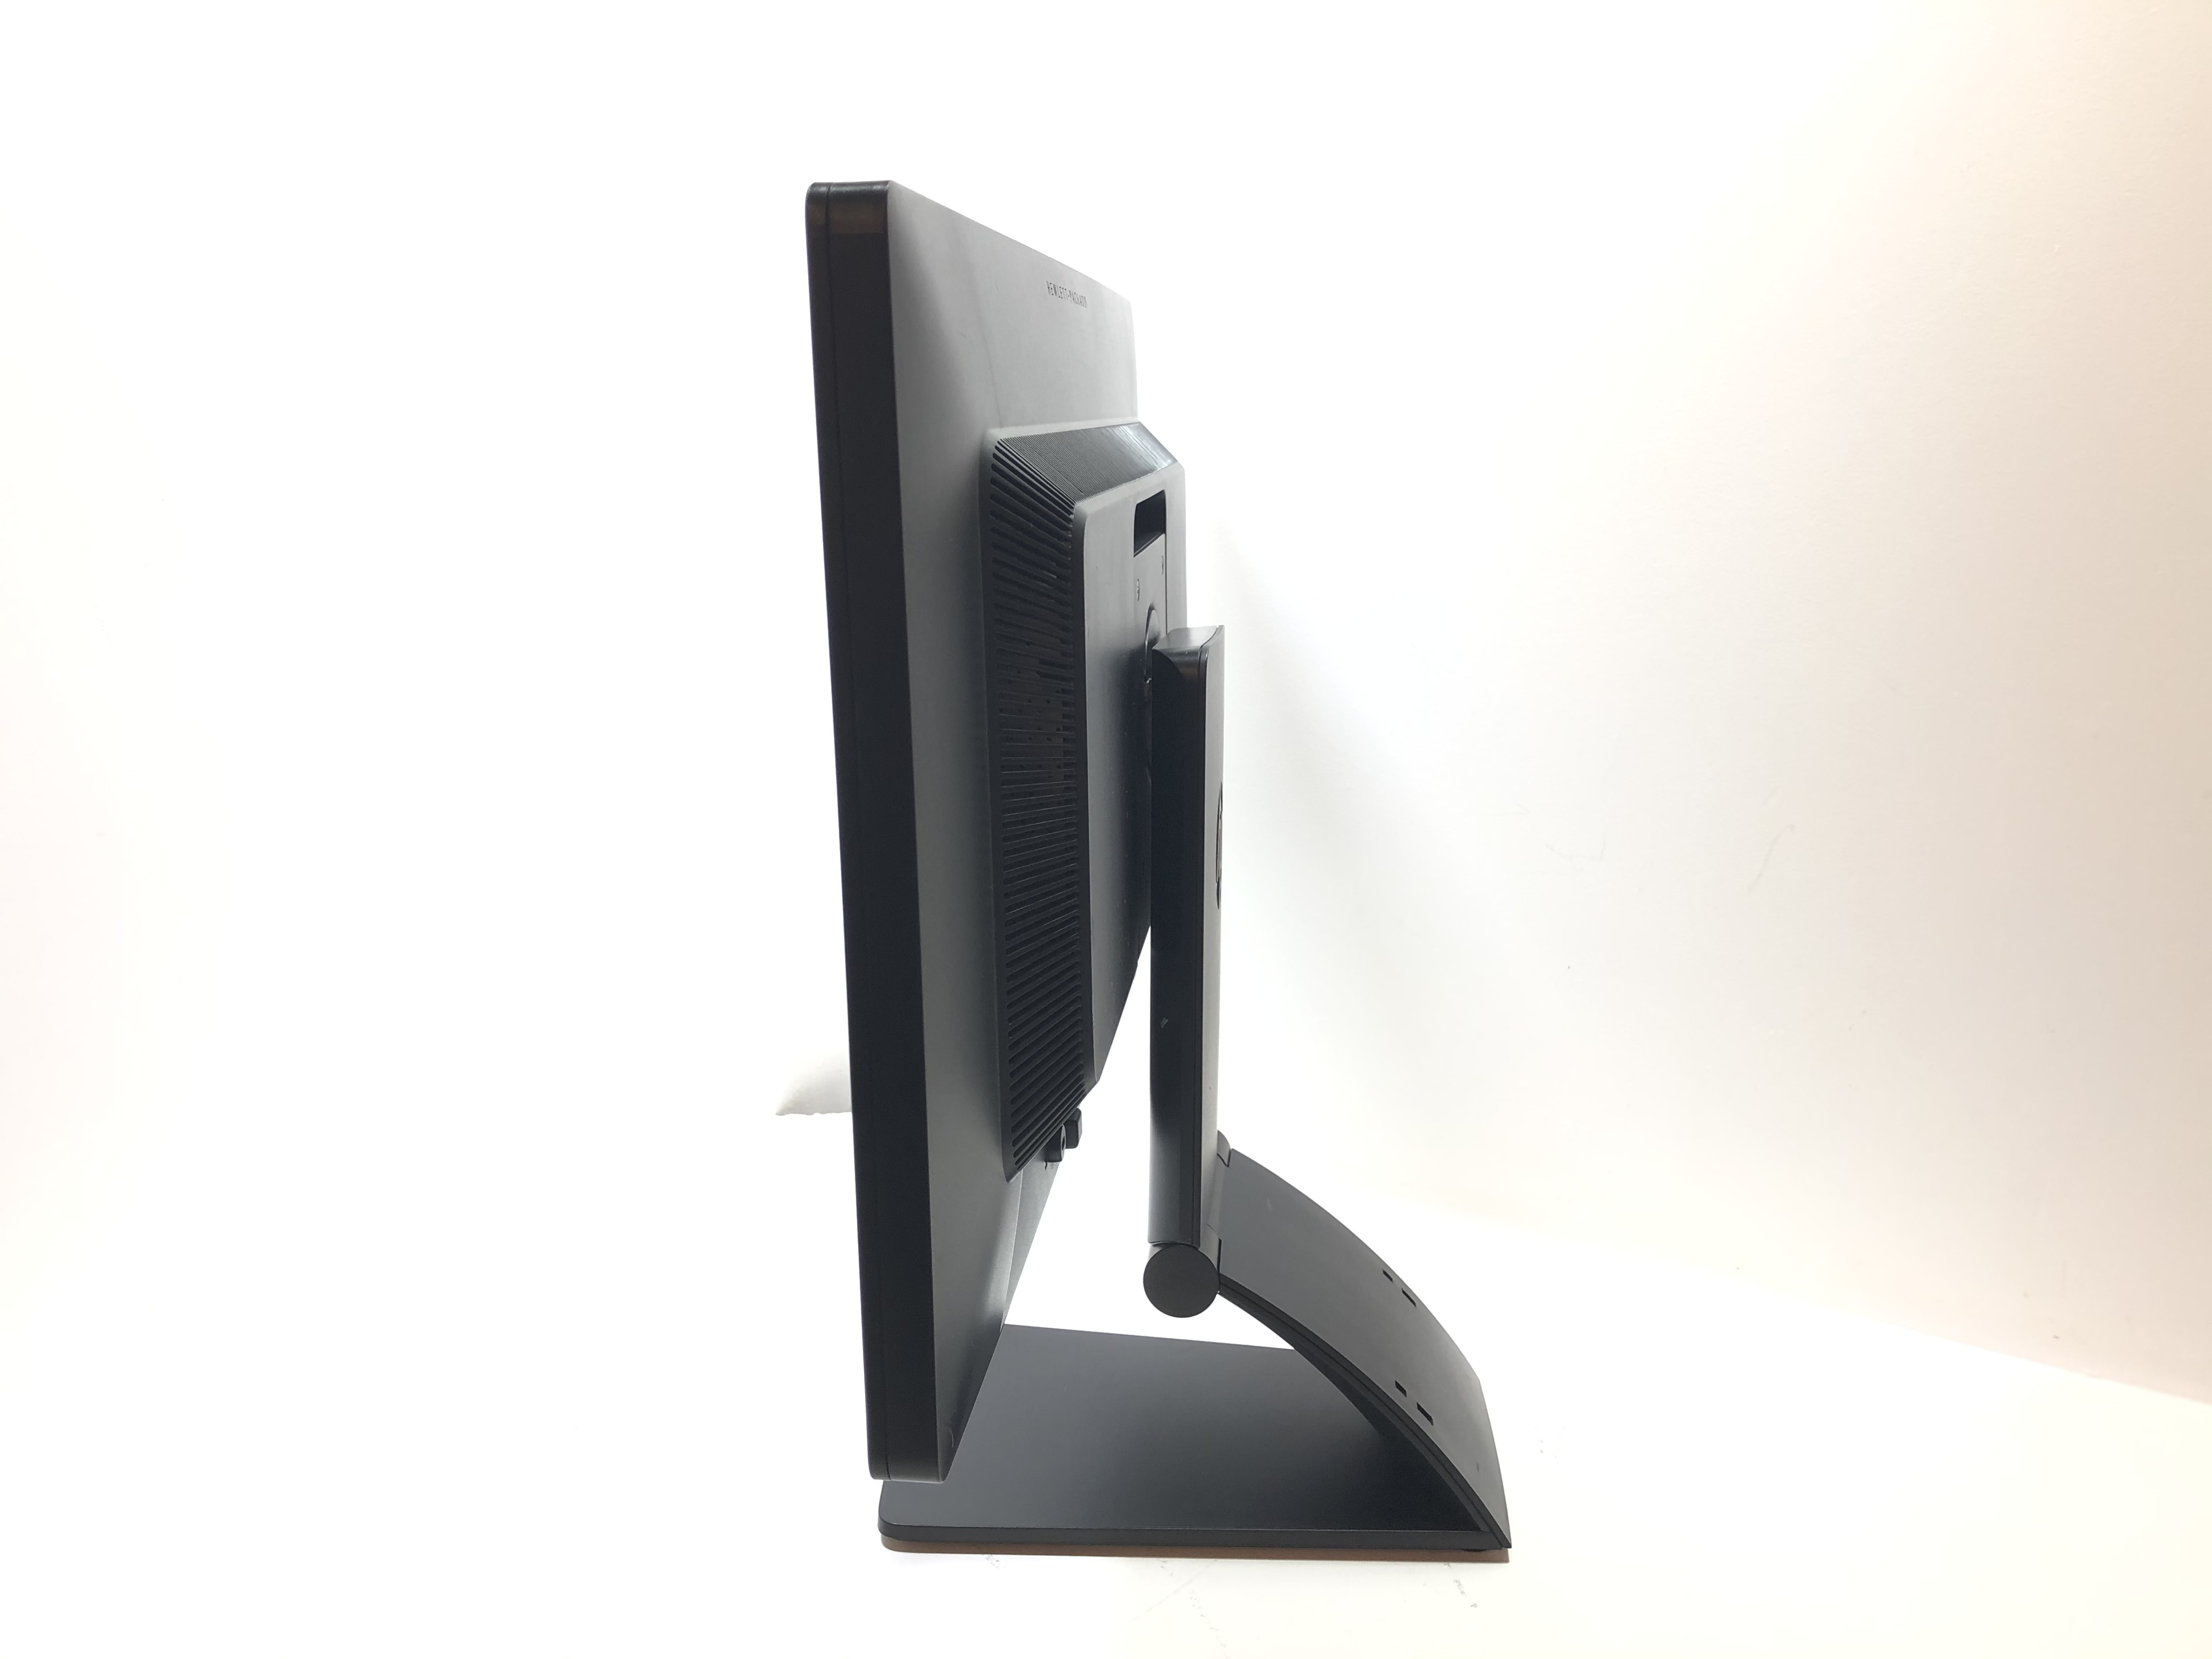 HP Z Display Z23i No 4